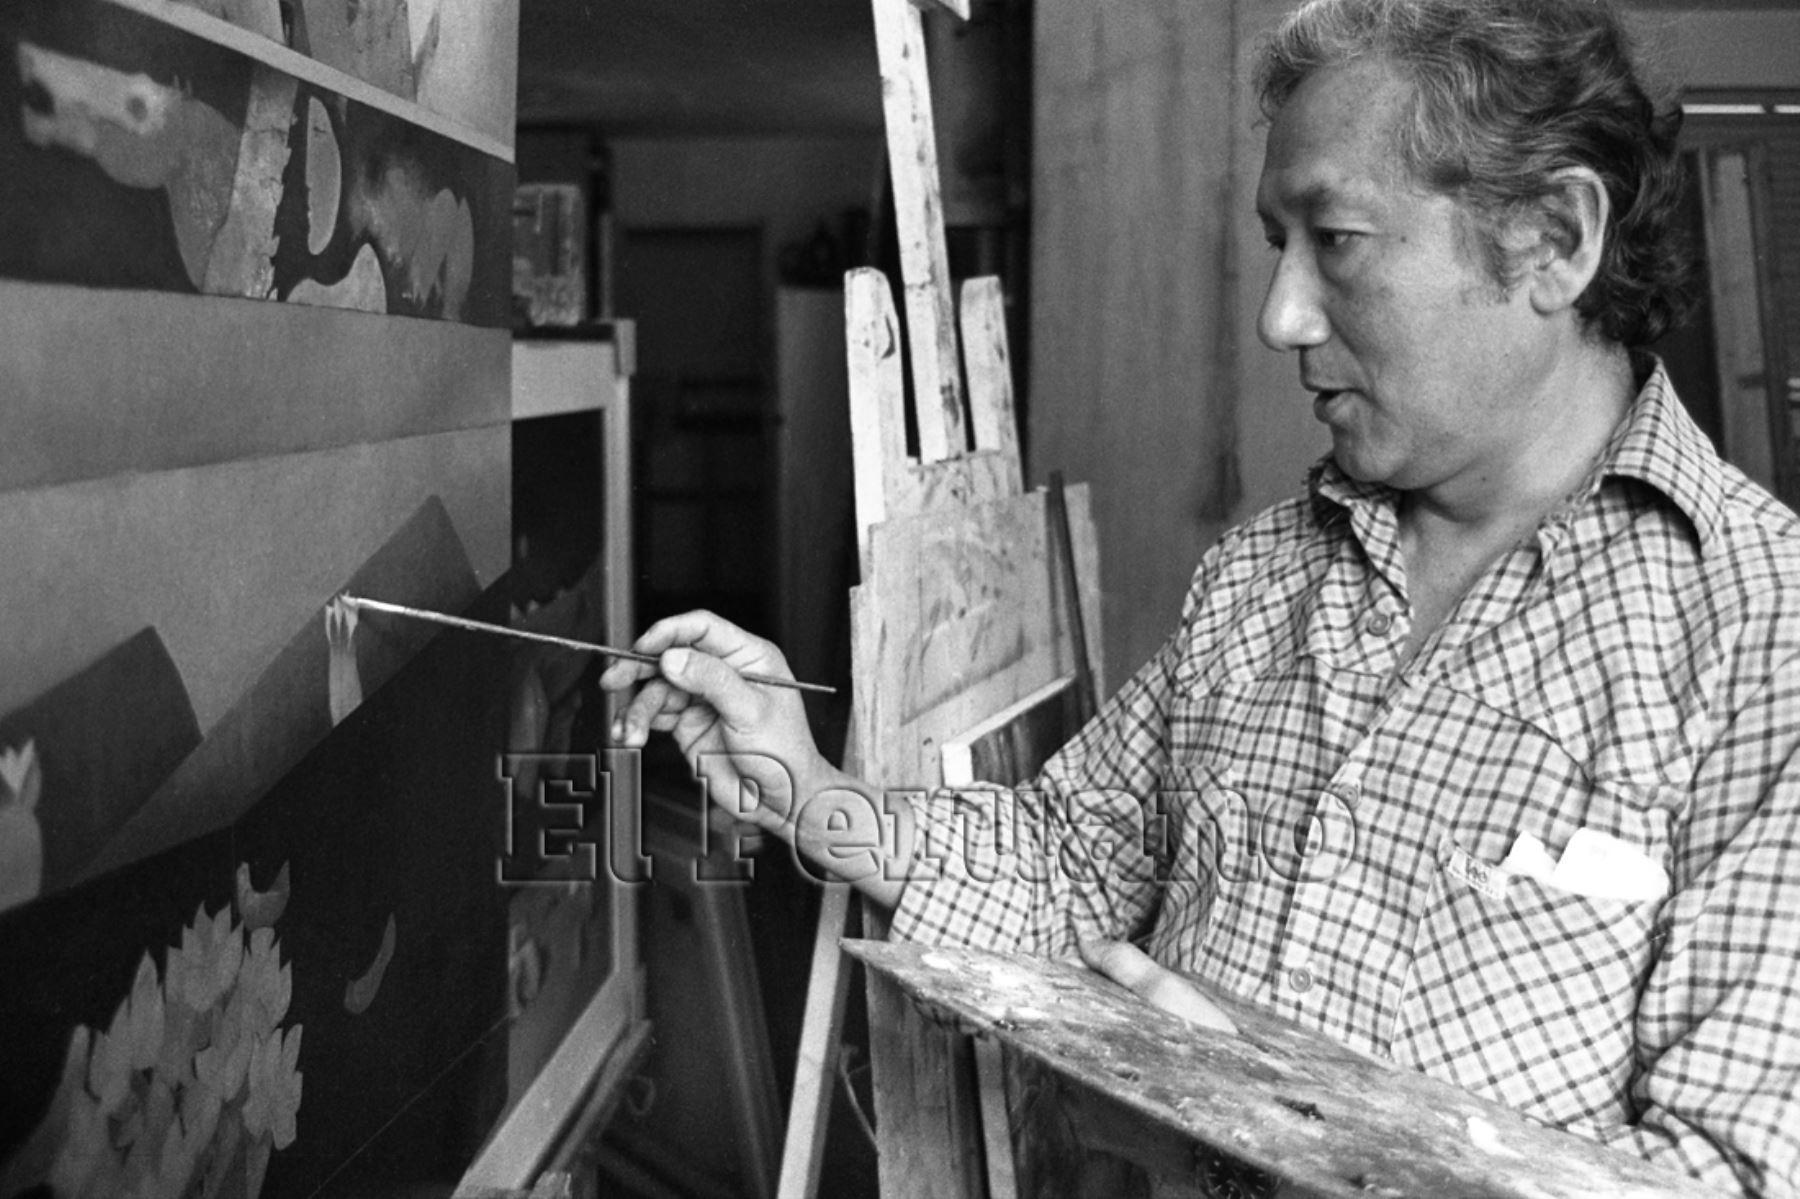 Lima - 31 octubre 1987 / Pintor peruano Venancio Shinki.